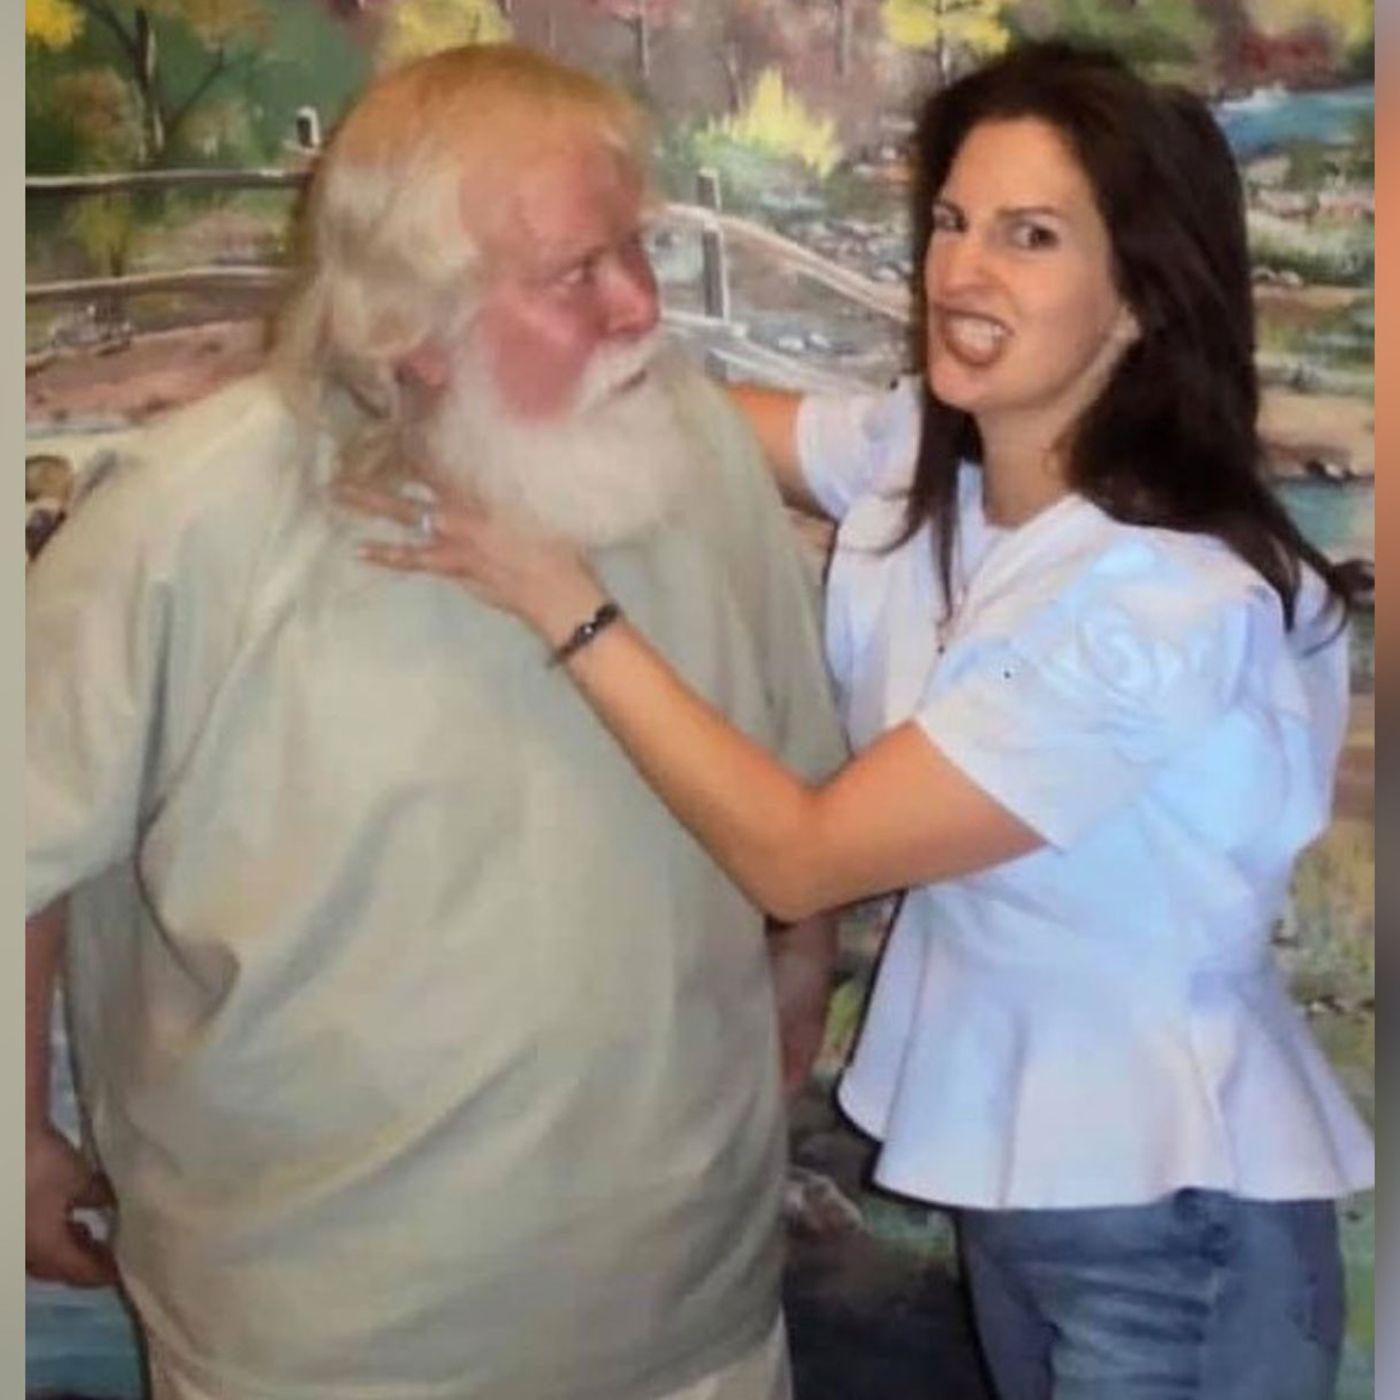 Interview with Jennifer Weiss, daughter of Deedeh Goodarzi